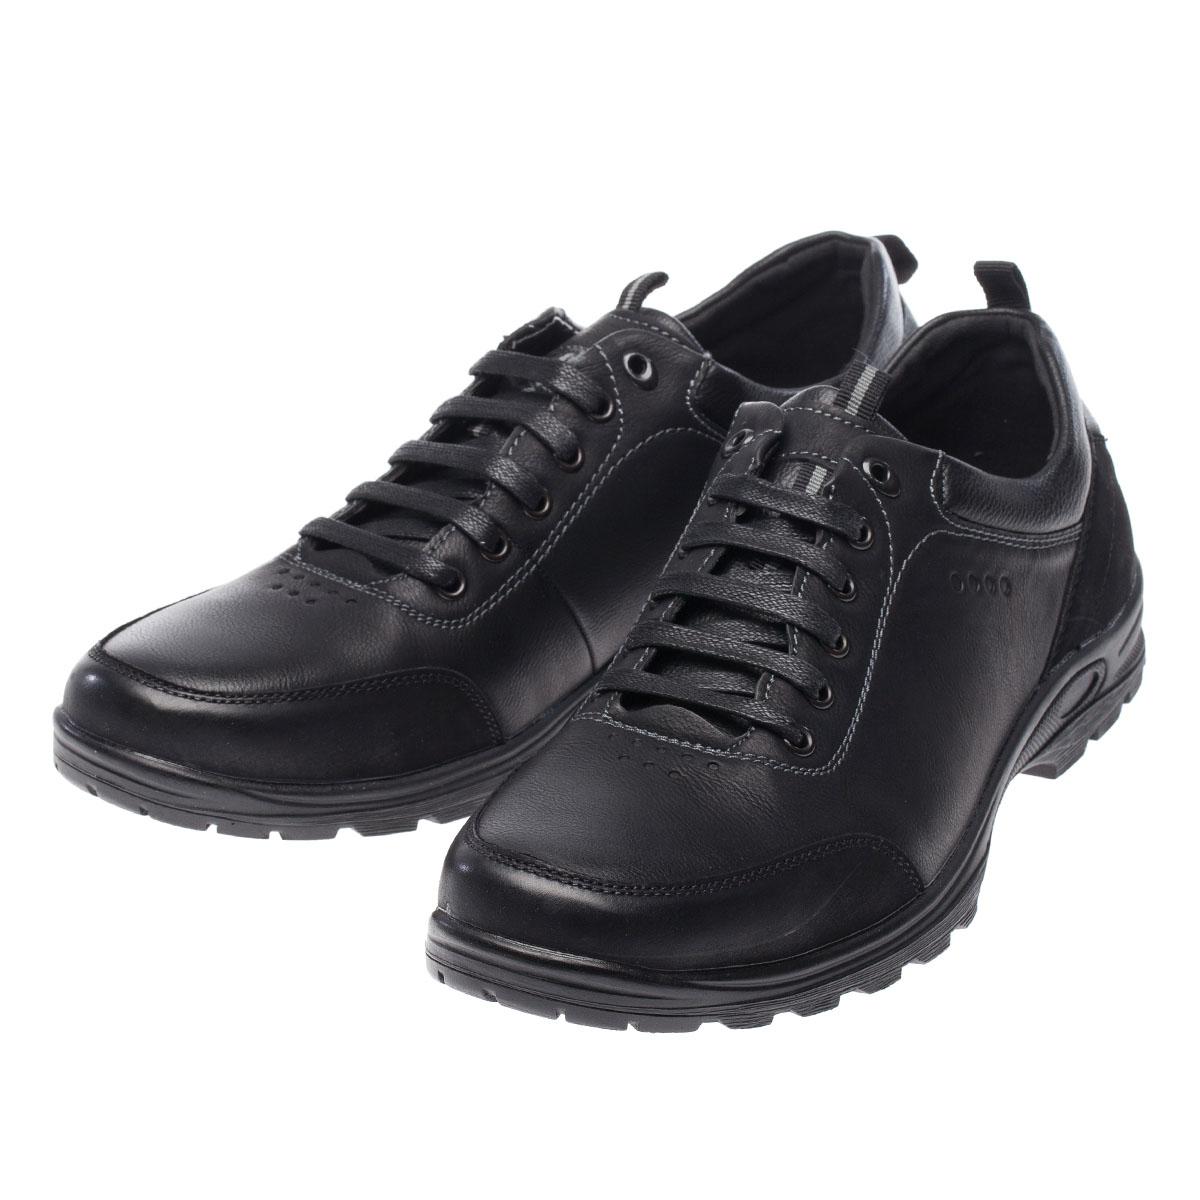 Туфли FERTO, 1849-1 туфли ferto c17 56511 1